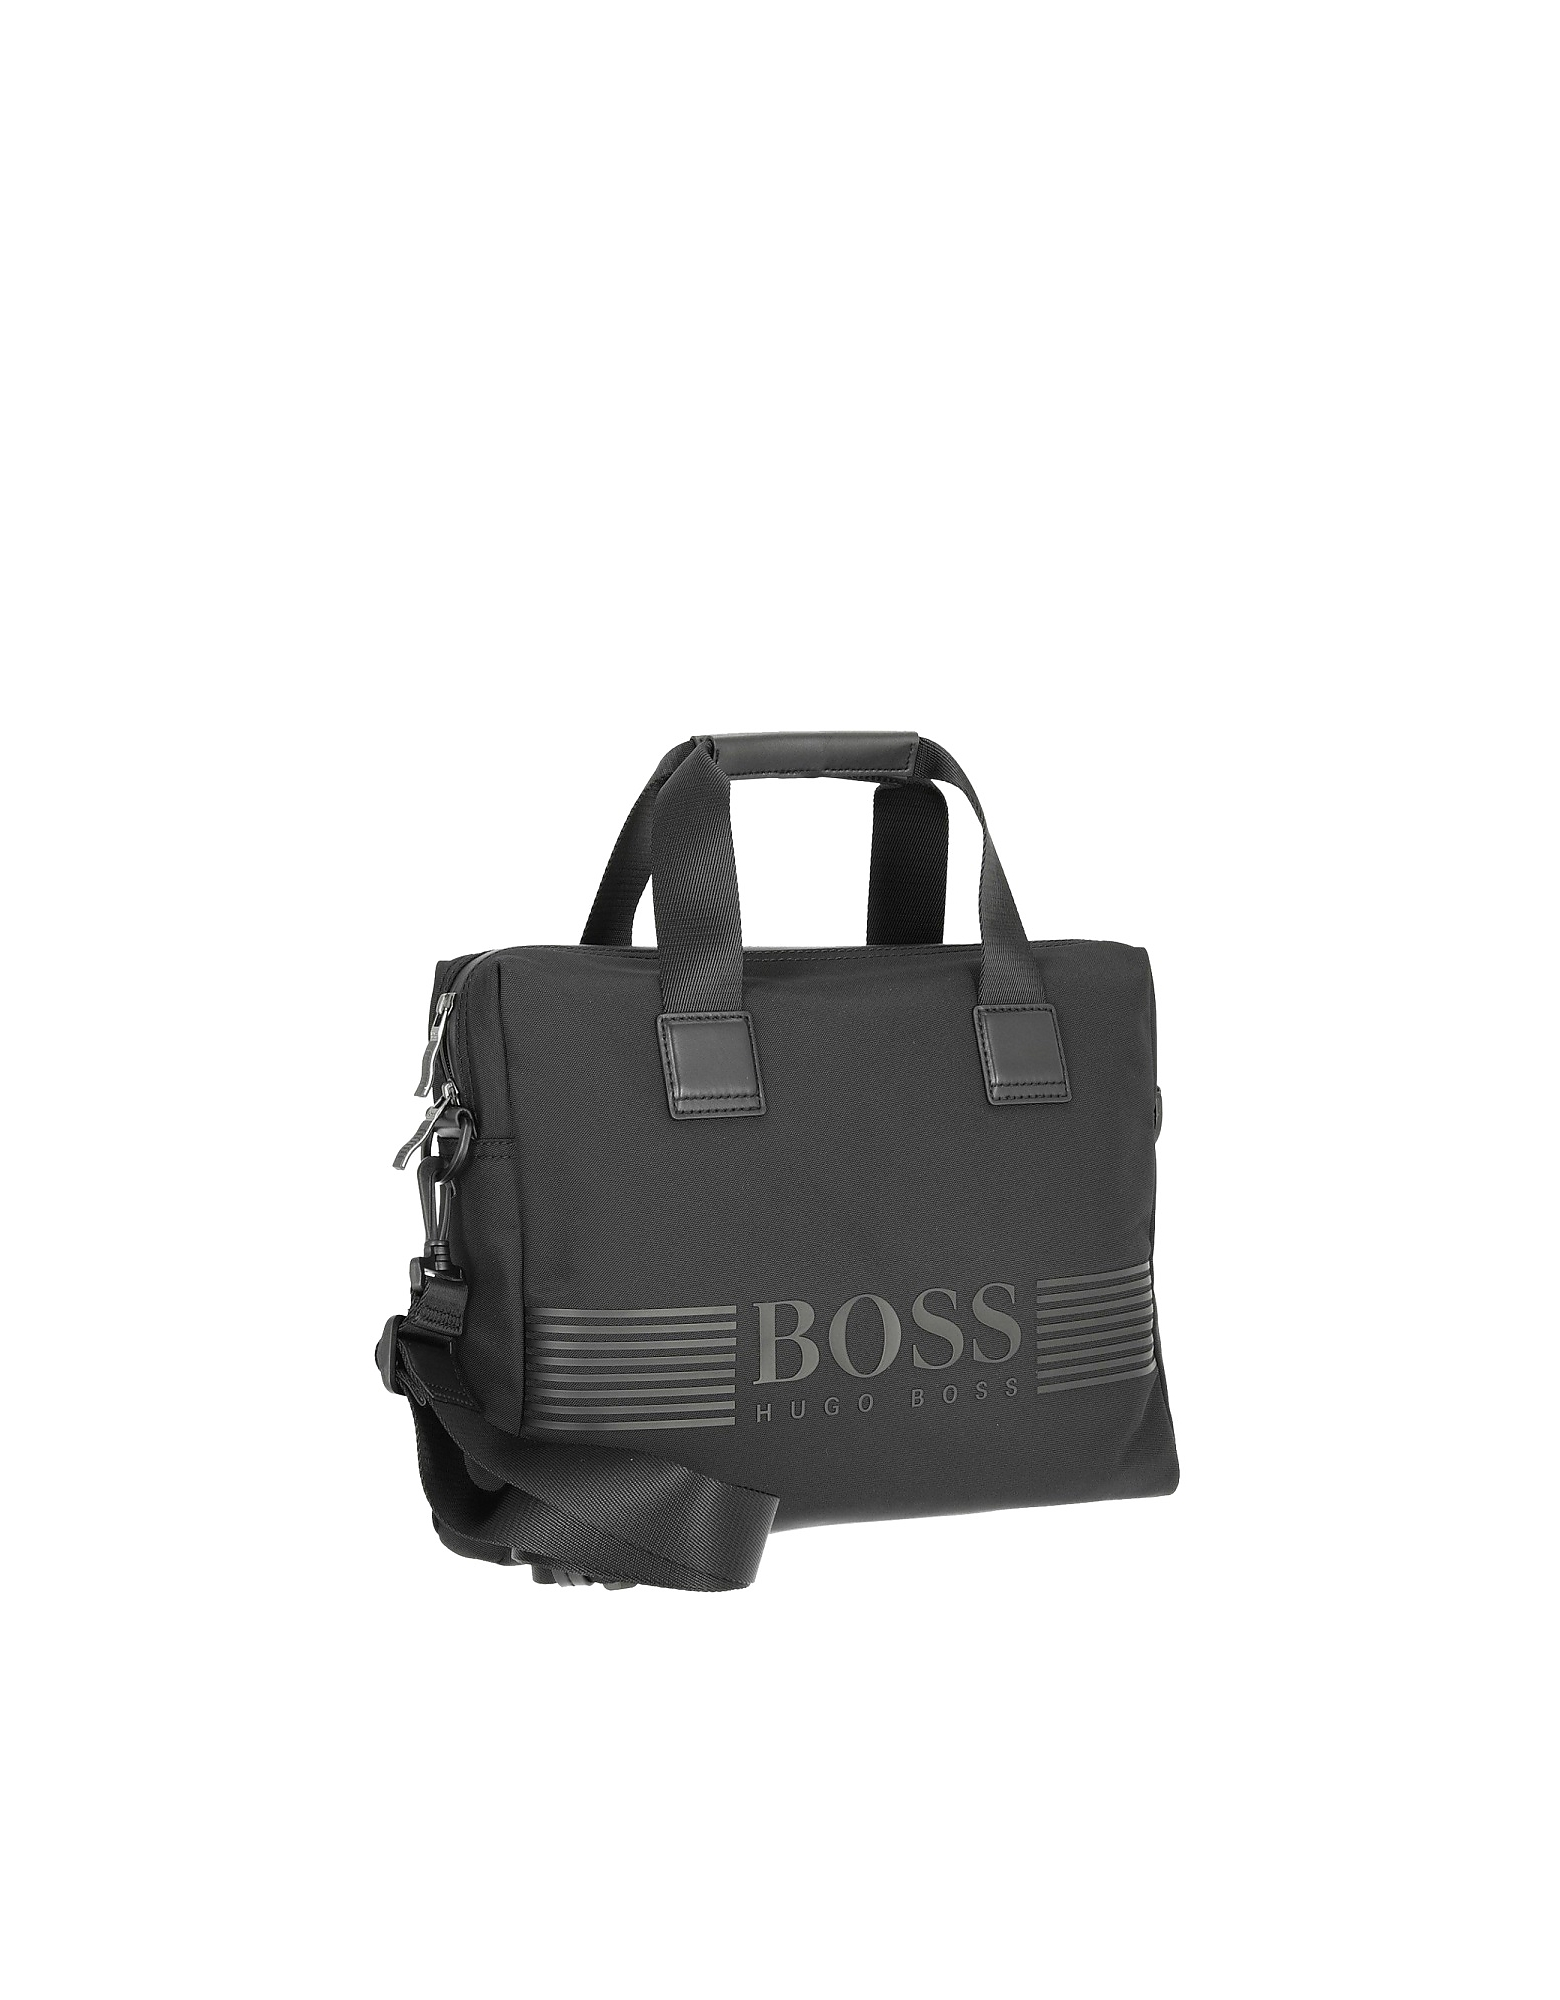 Hugo Boss DOCUMENT BAG WITH LOGO